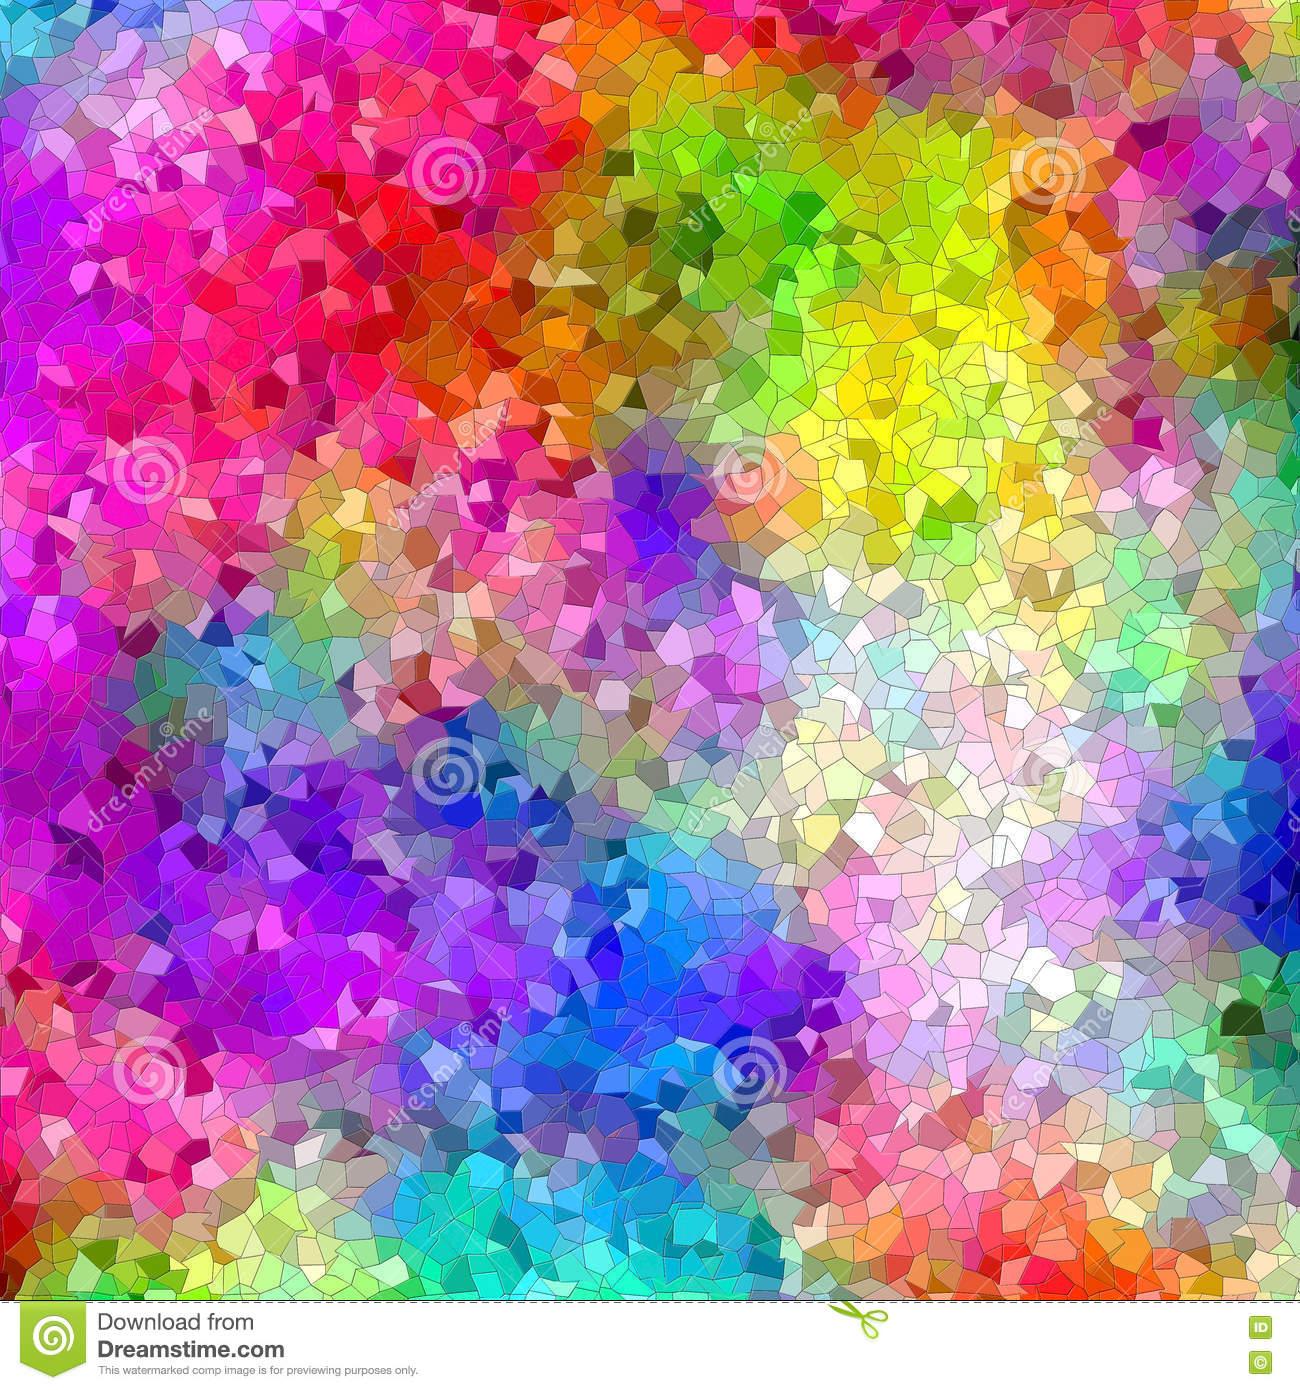 Plasma Coloring Download Plasma Coloring For Free